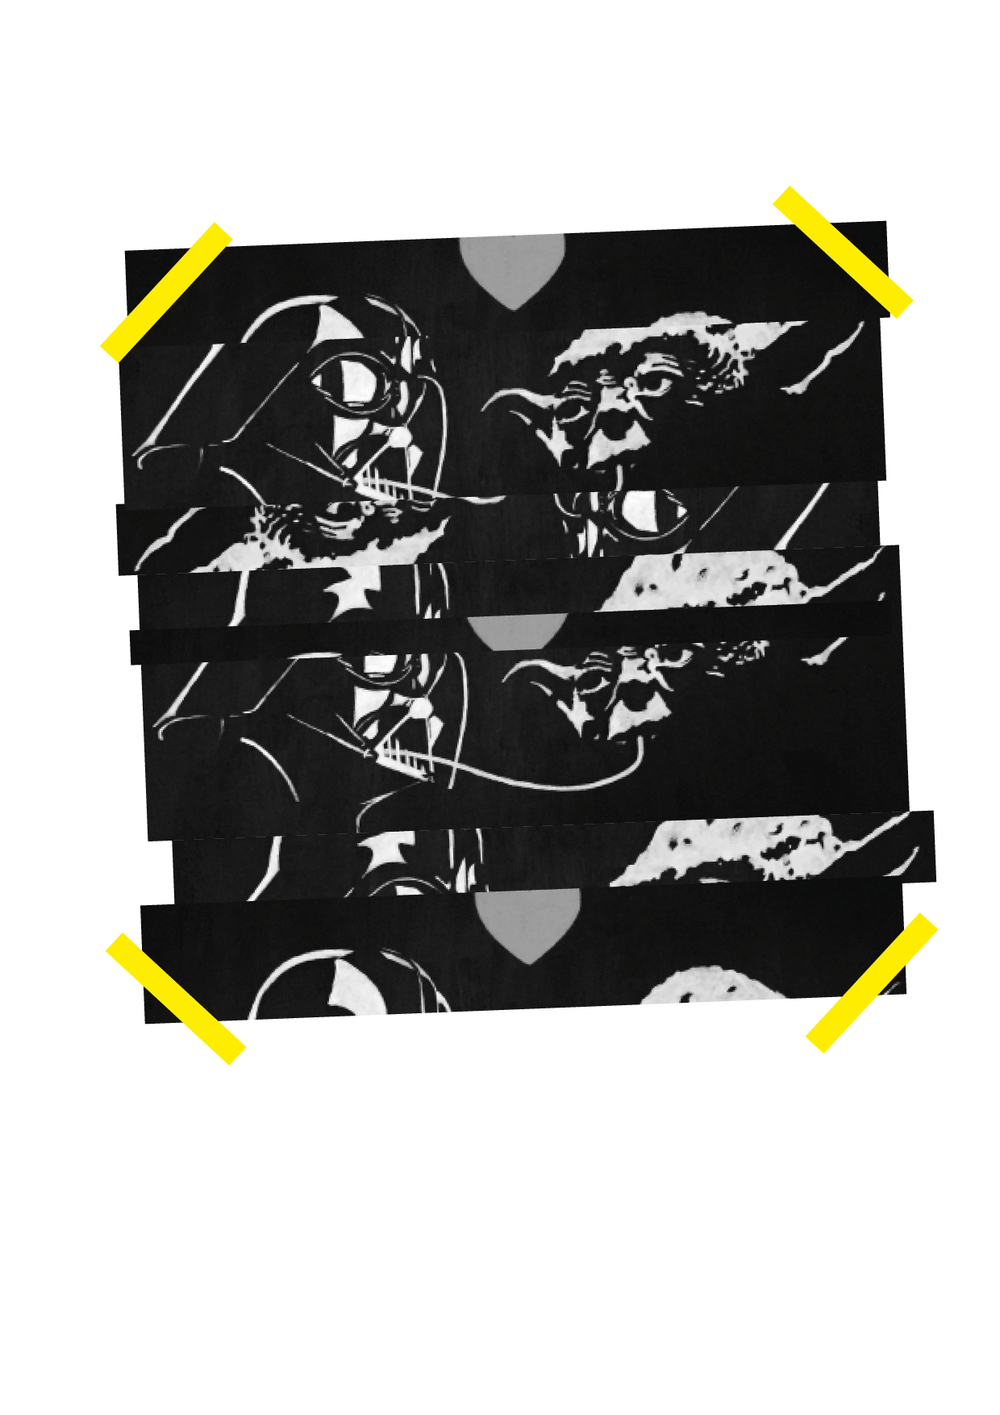 SNUFF ZINE-foxes-multistorey18.jpg